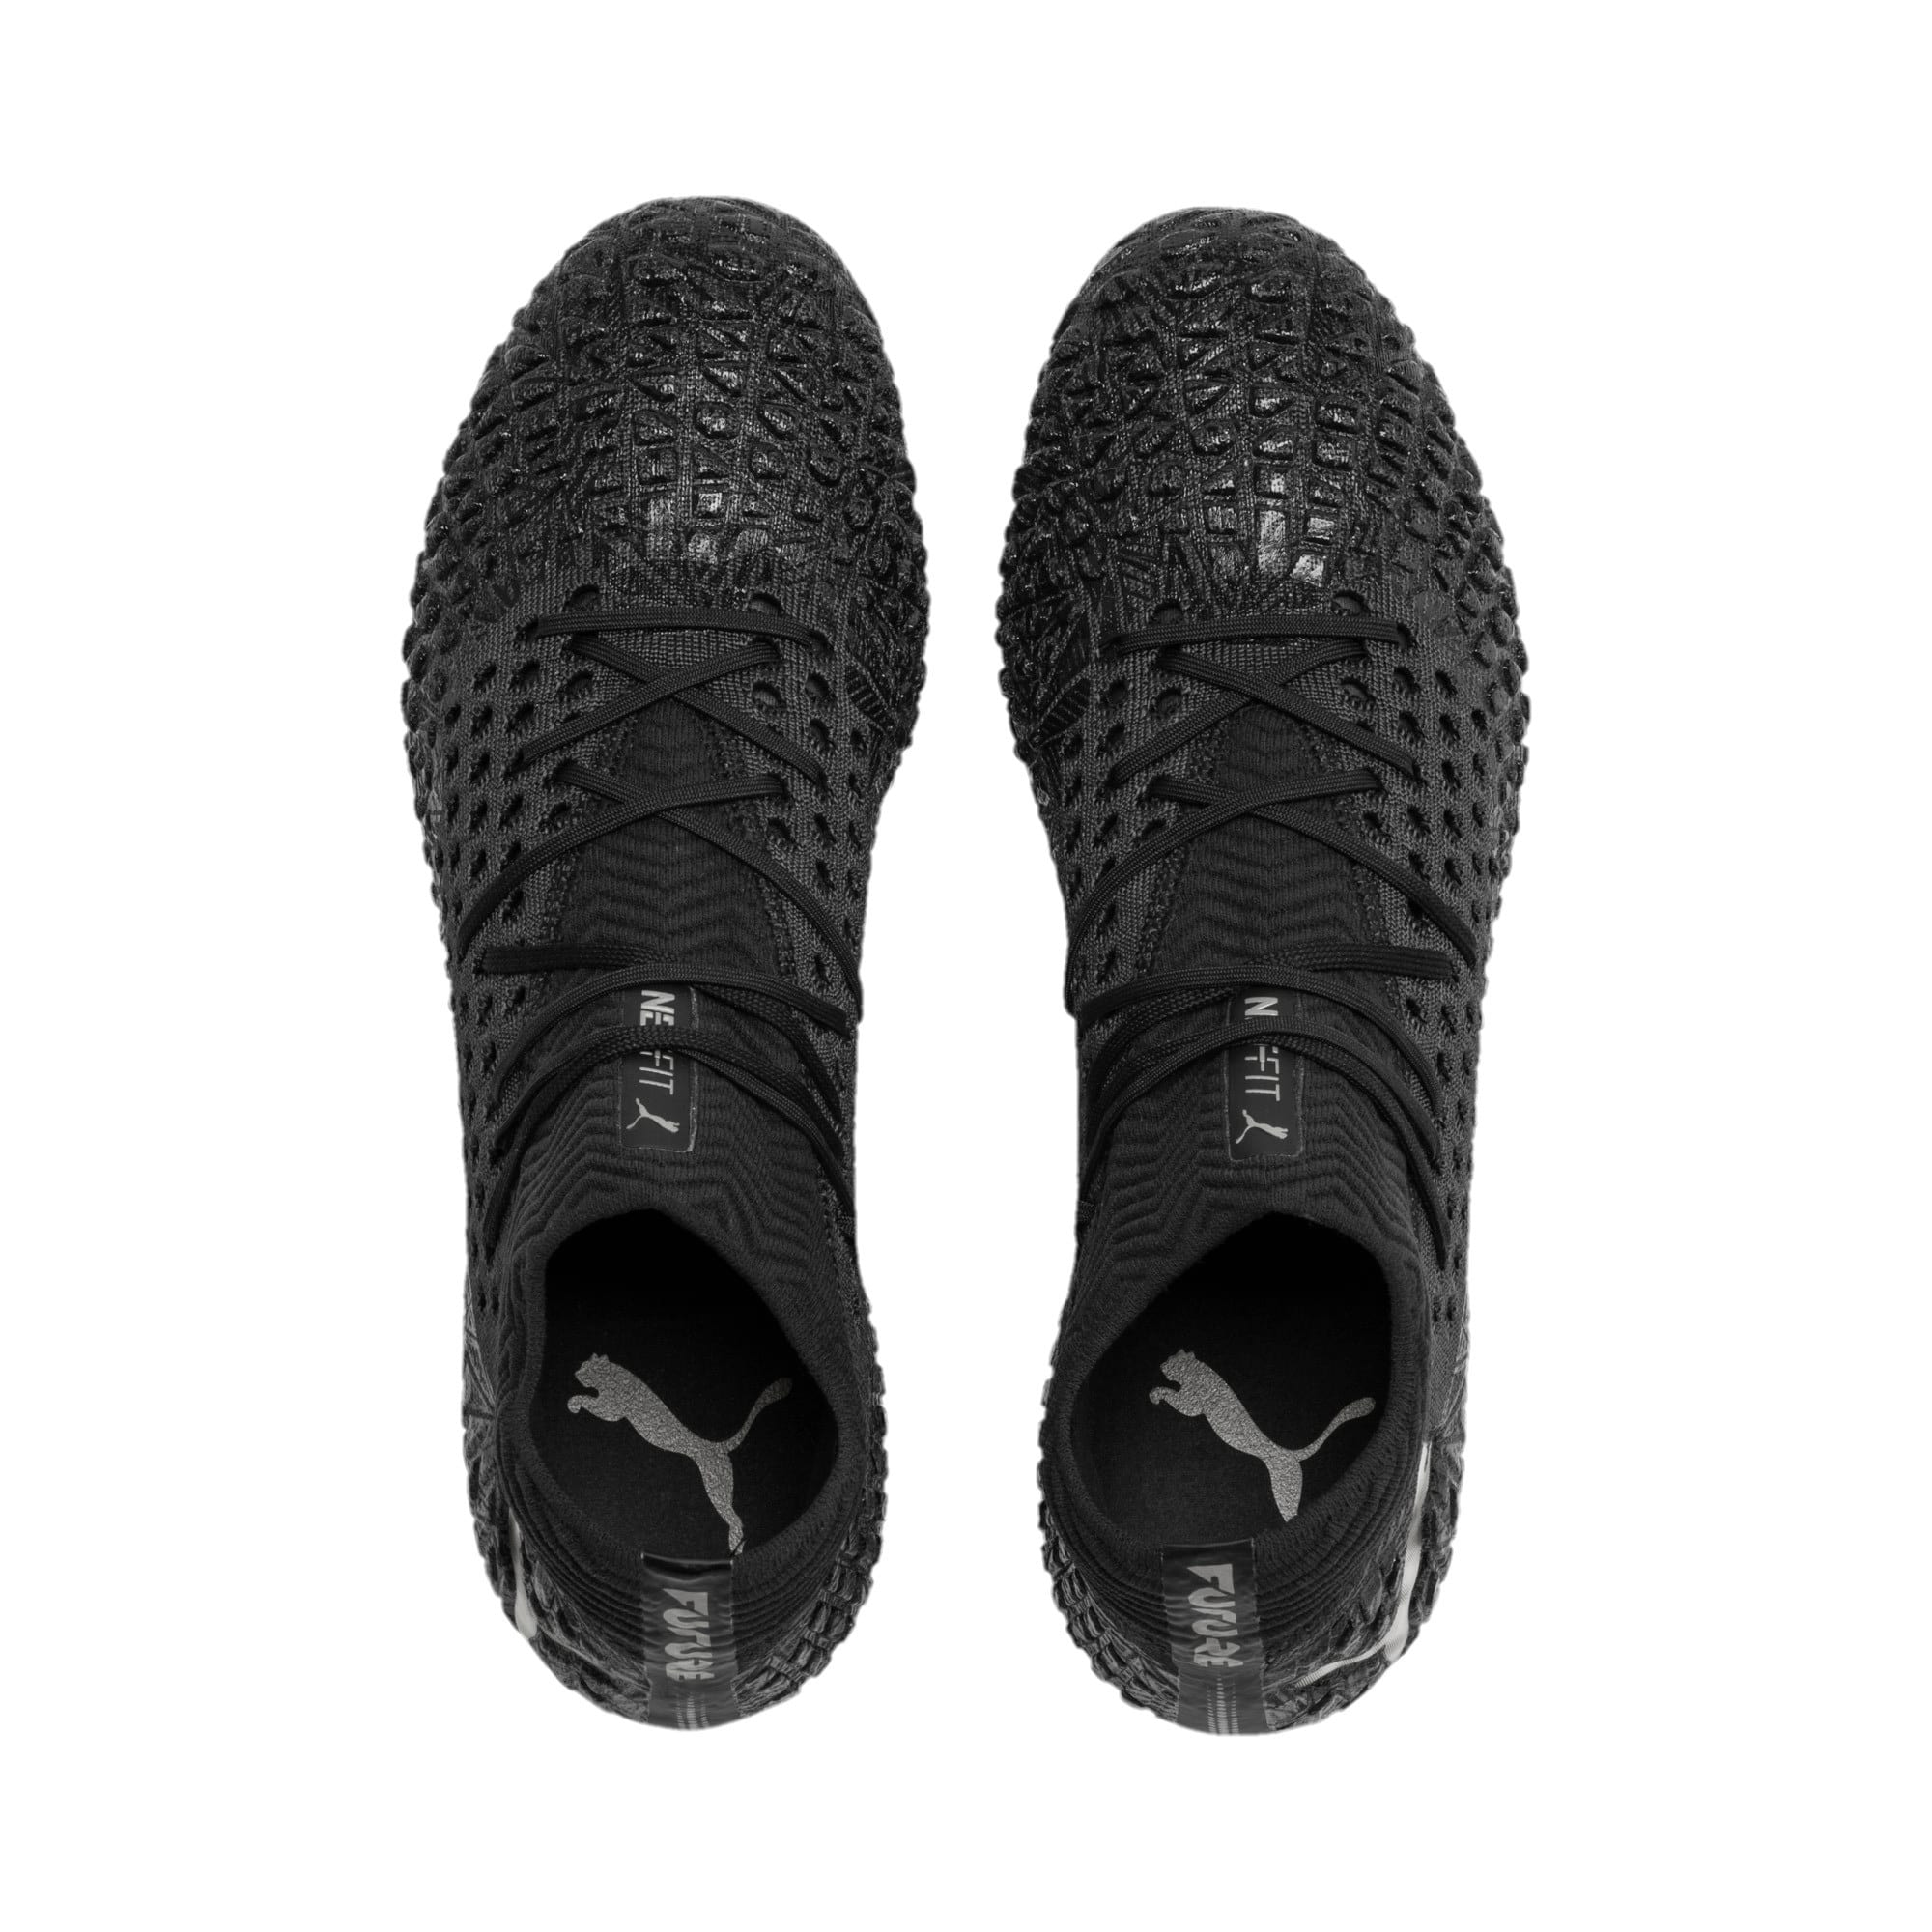 Thumbnail 7 of FUTURE 4.1 NETFIT FG/AG Men's Soccer Cleats, Black-Black-Puma Aged Silver, medium